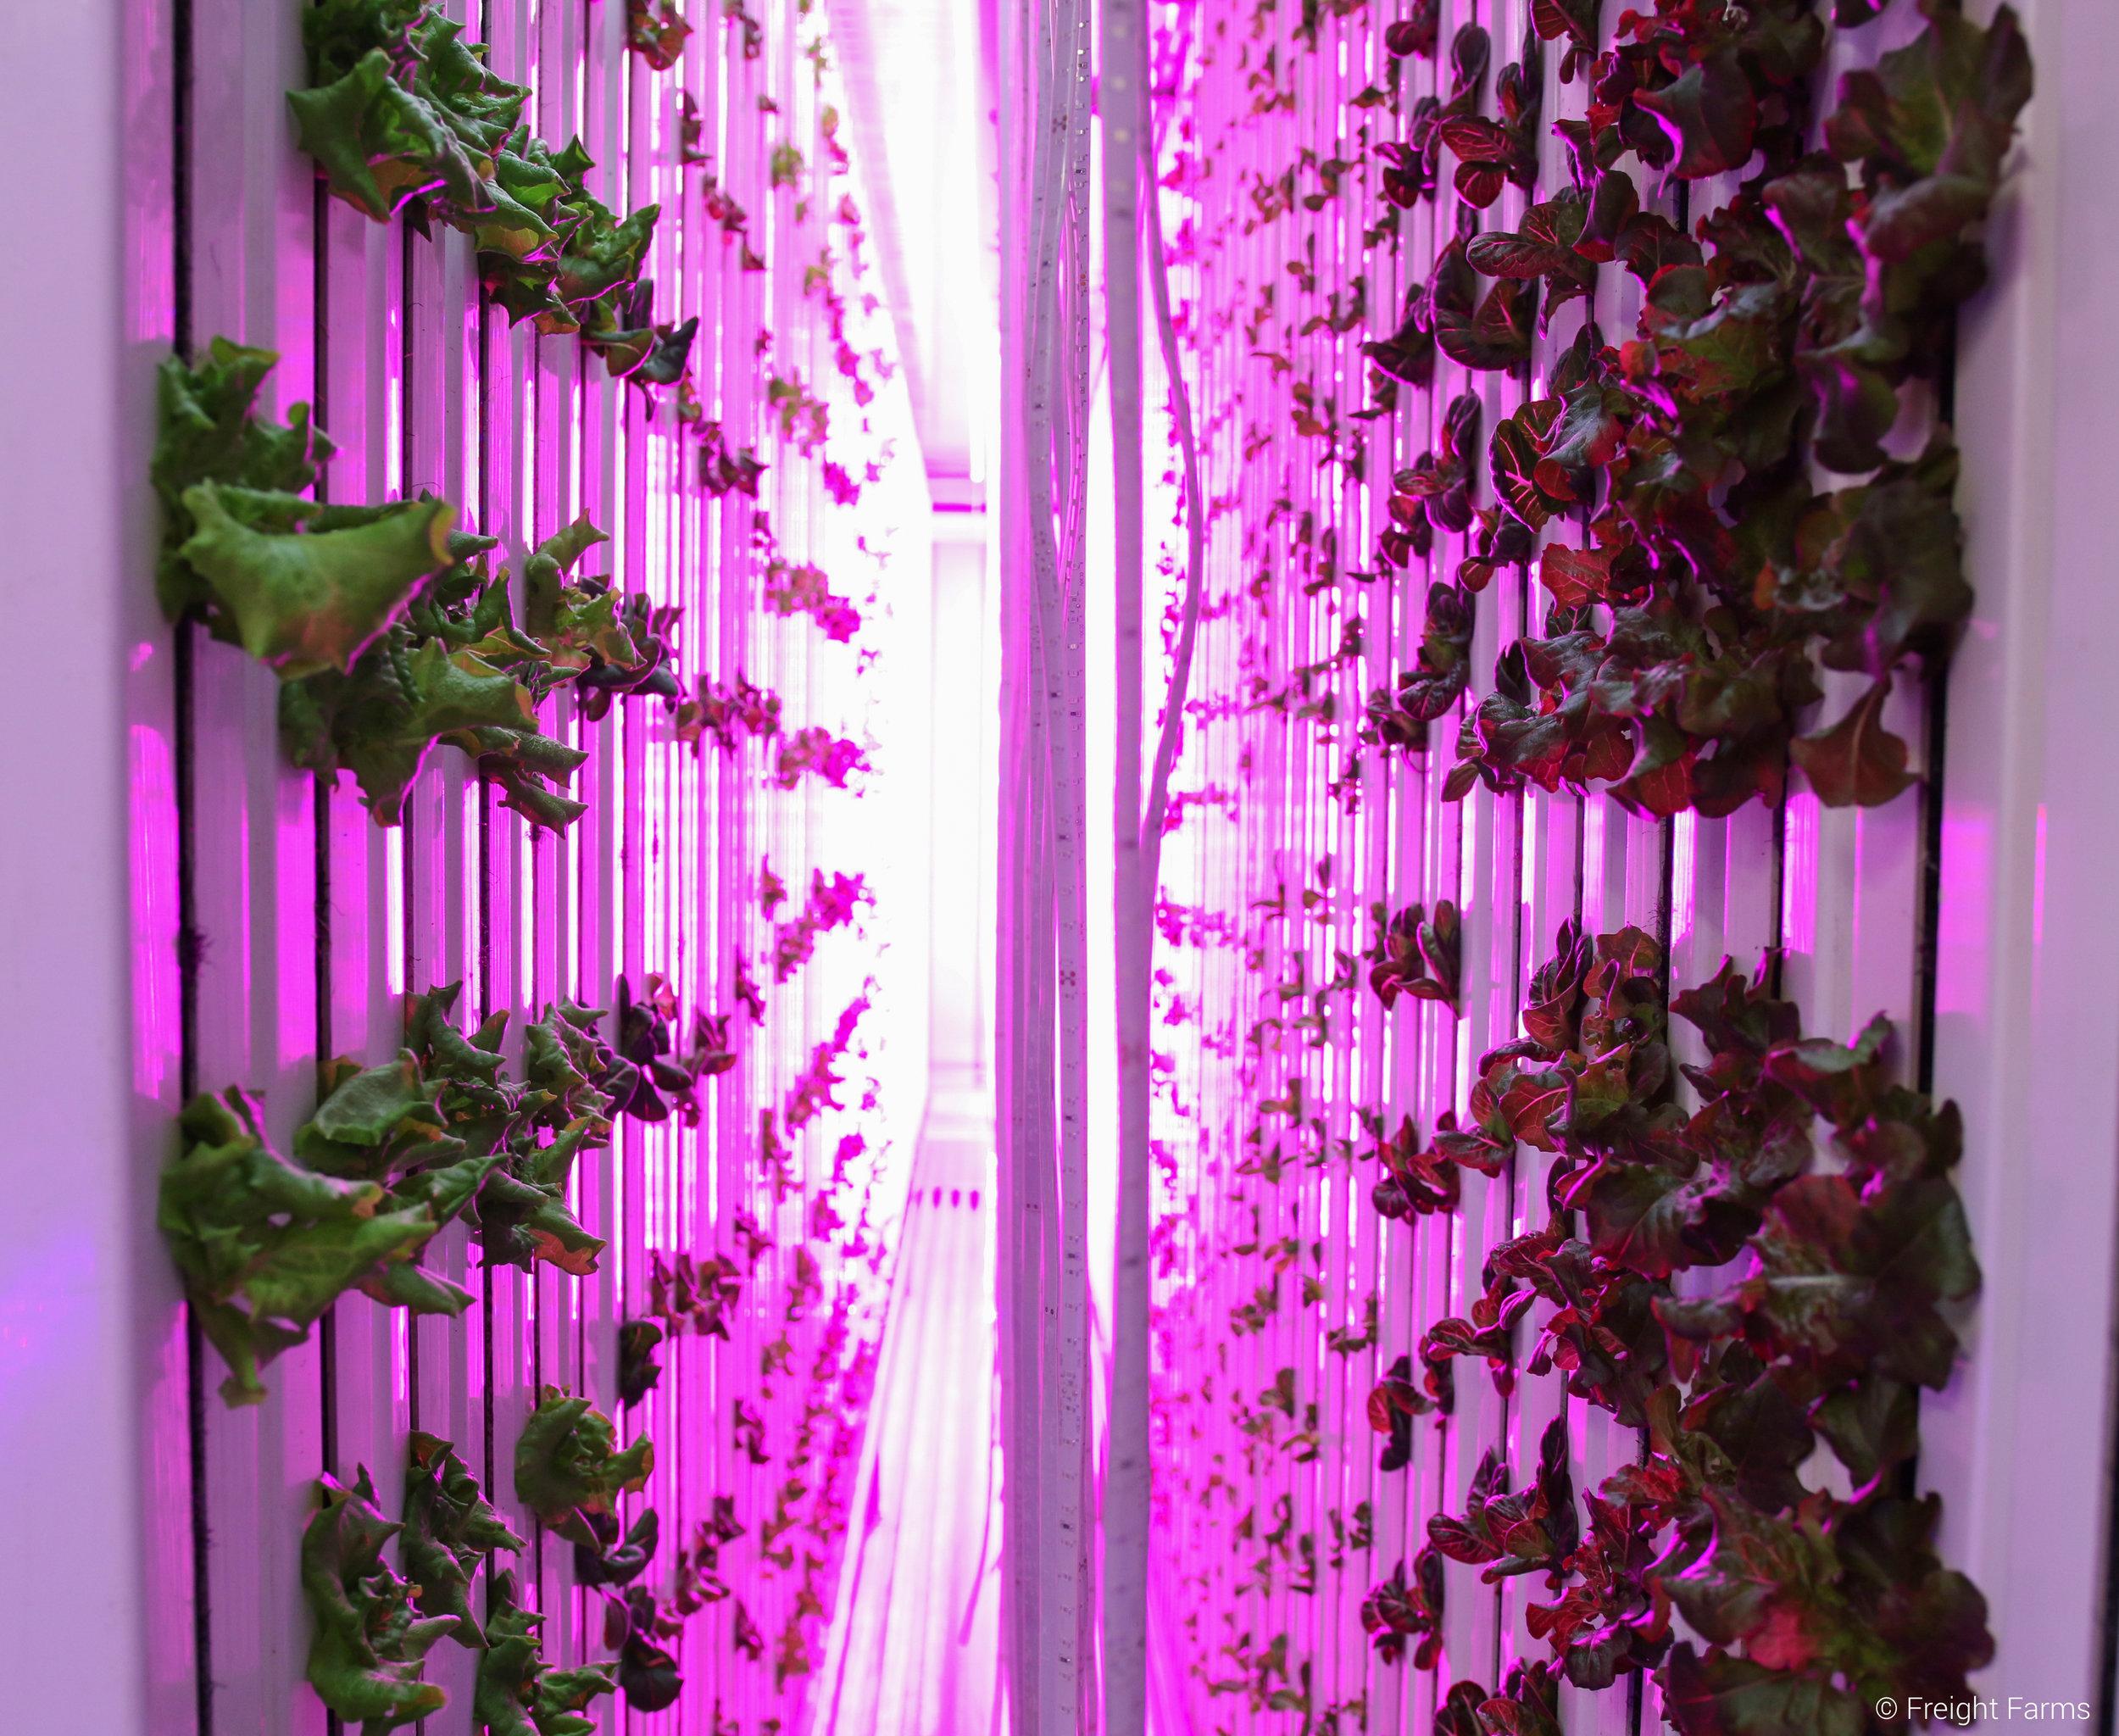 Freight Farms LED Lights 2.jpg